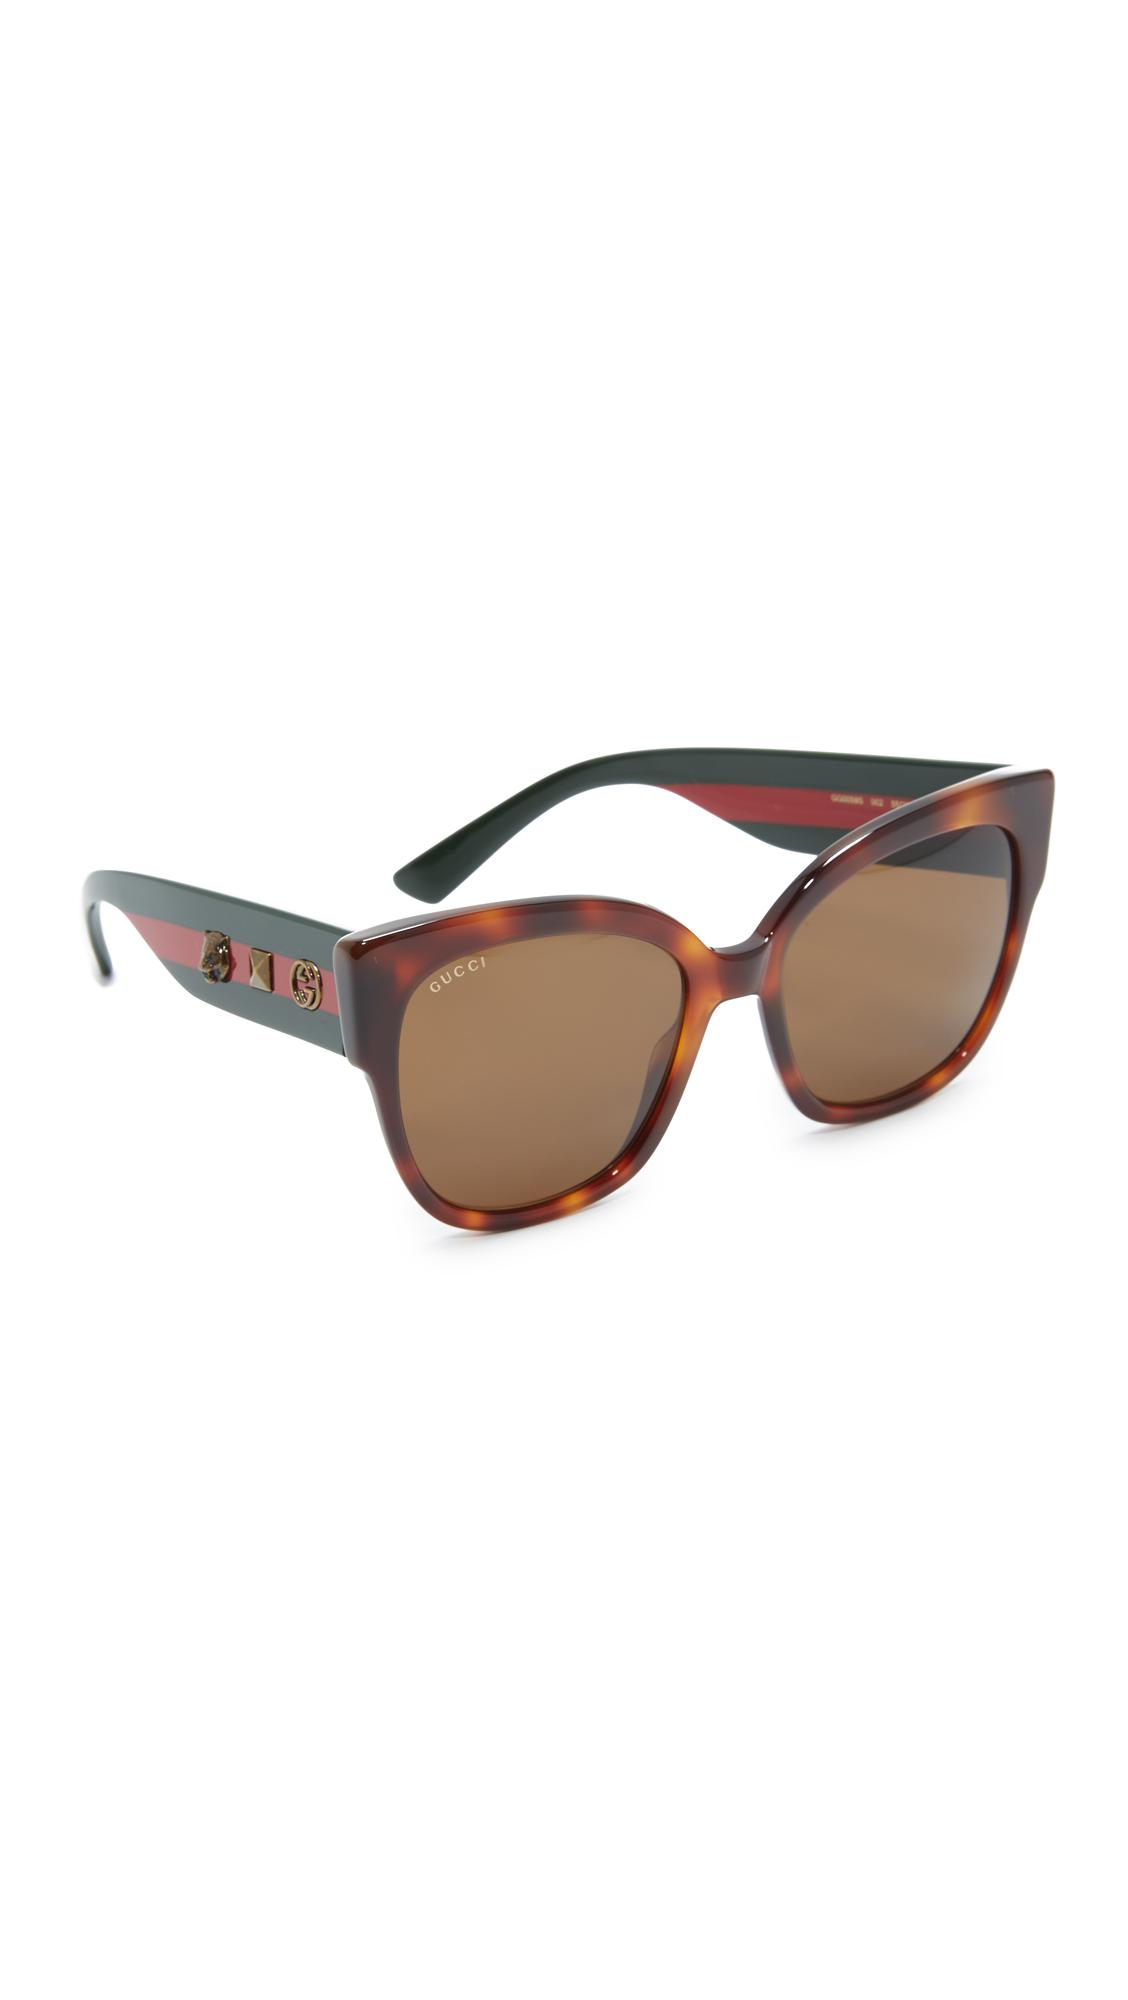 Gucci Oversized Tiger Sunglasses - Havana/Brown at Shopbop